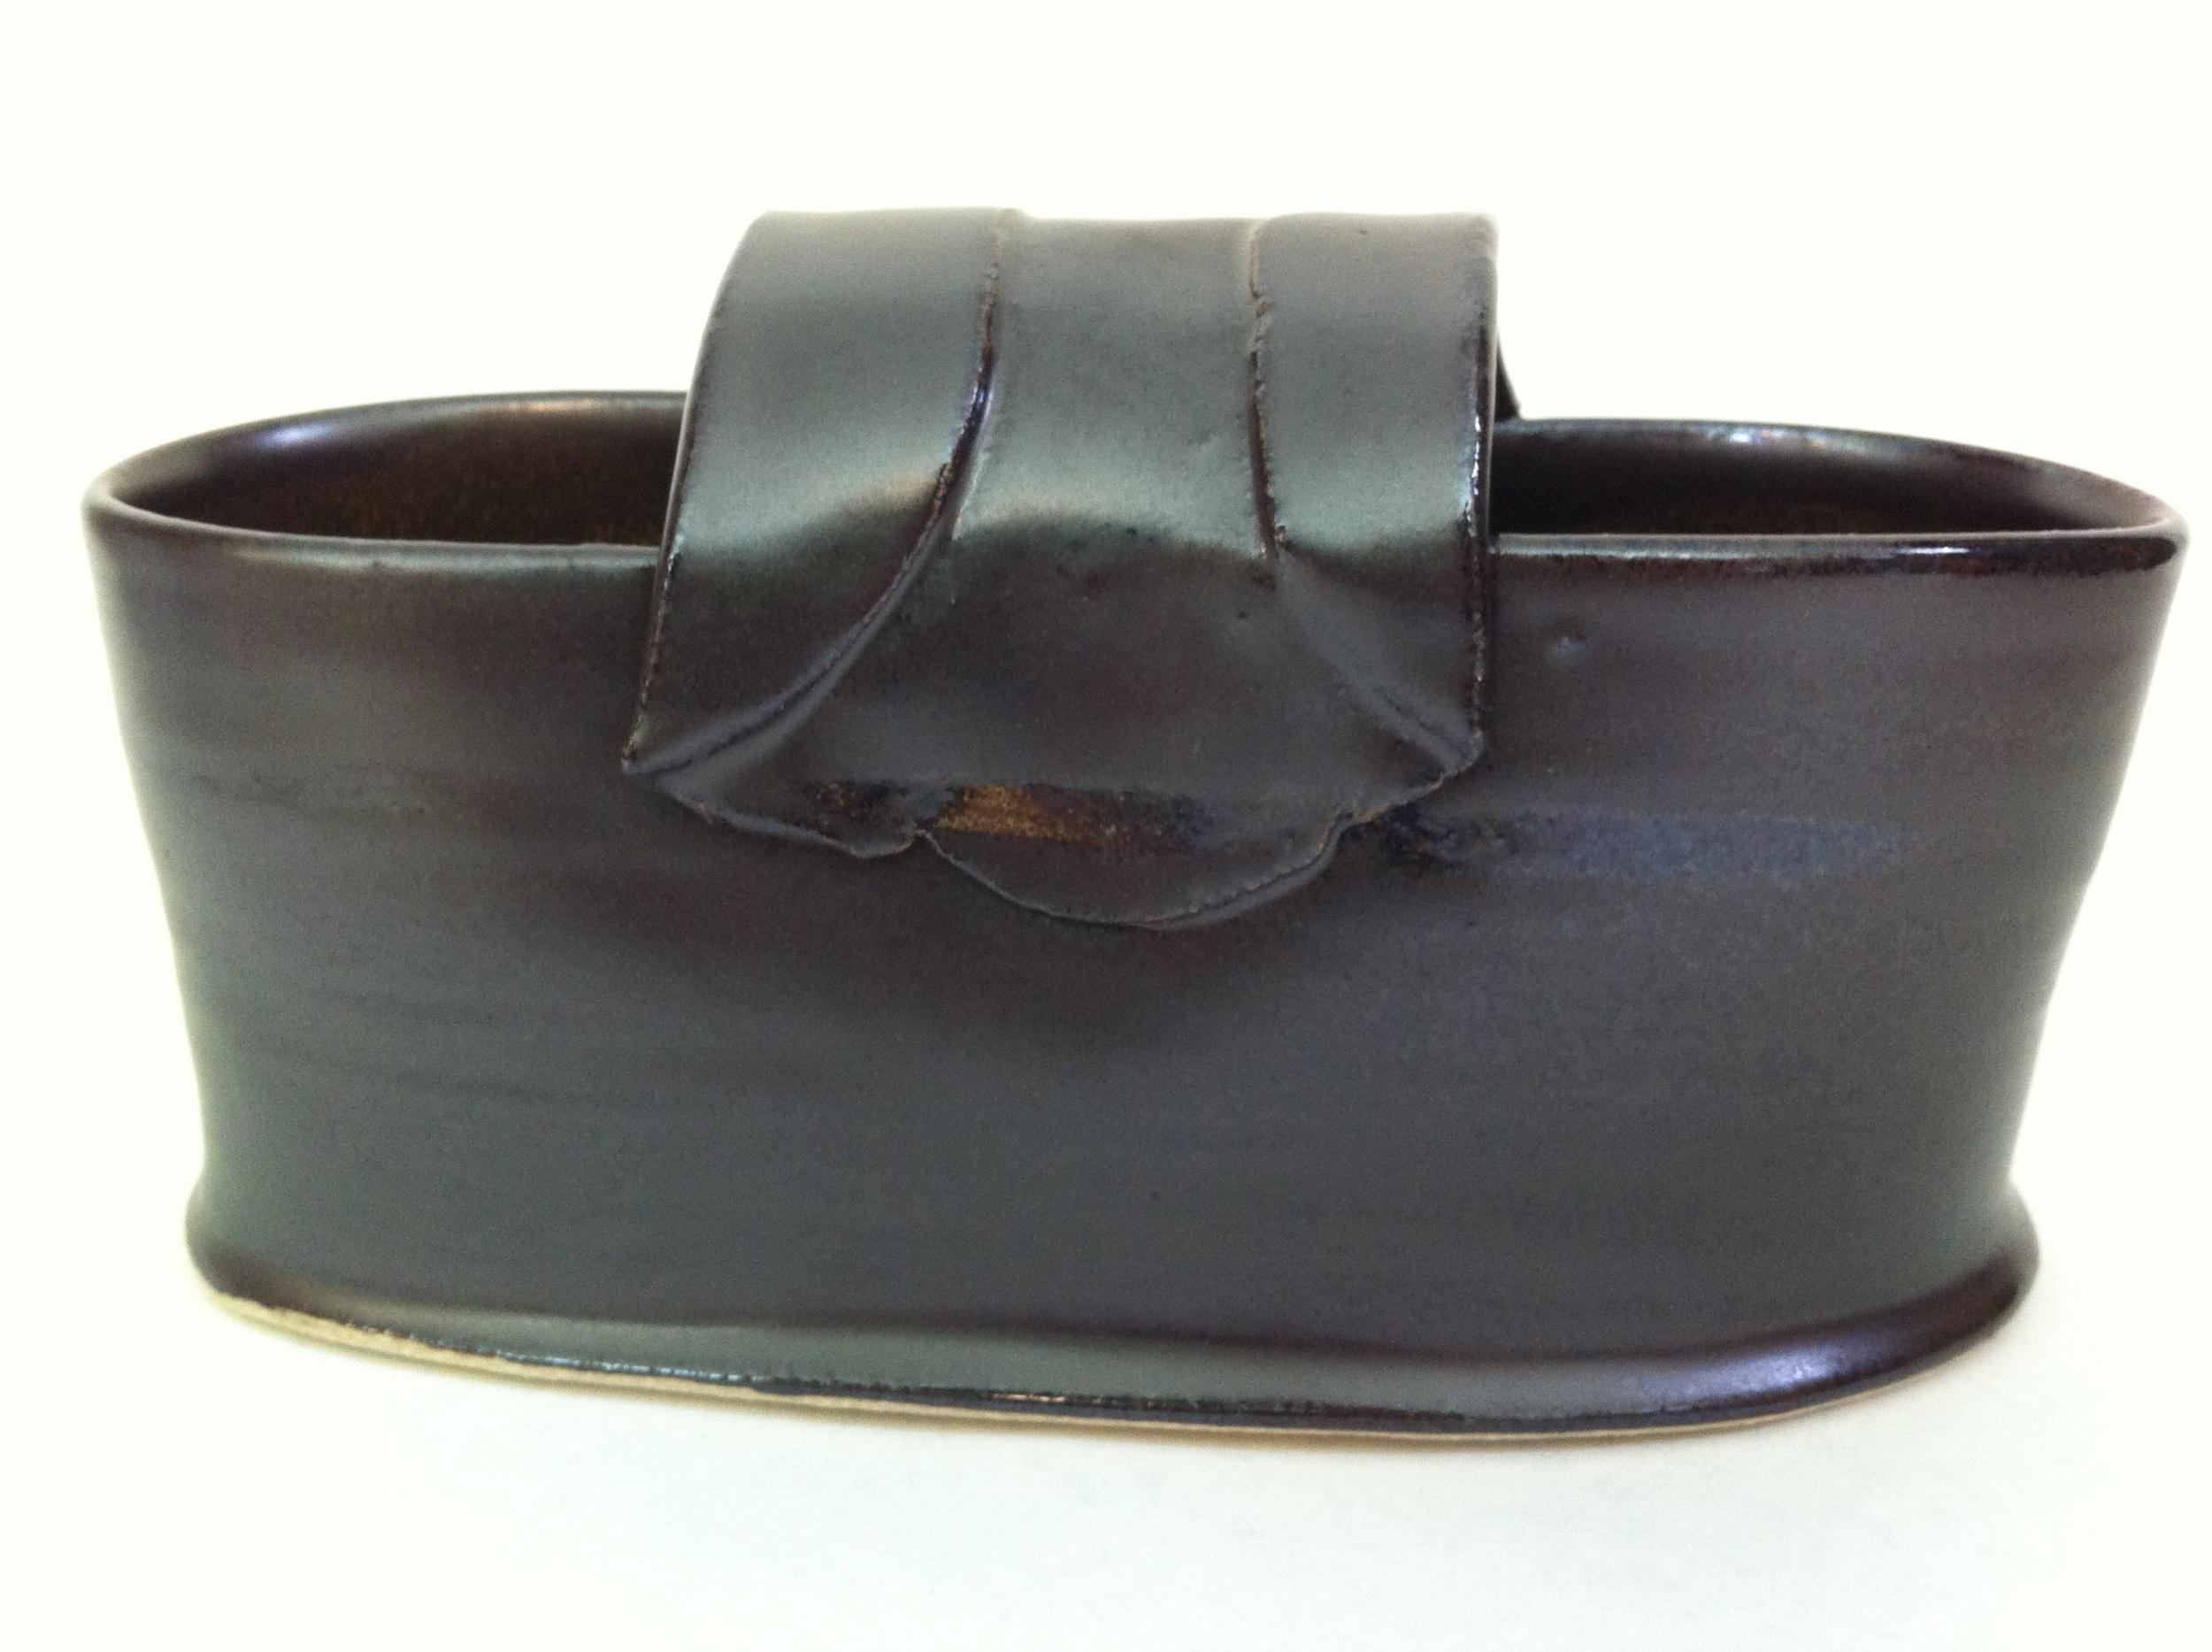 handmade ceramic bread basket